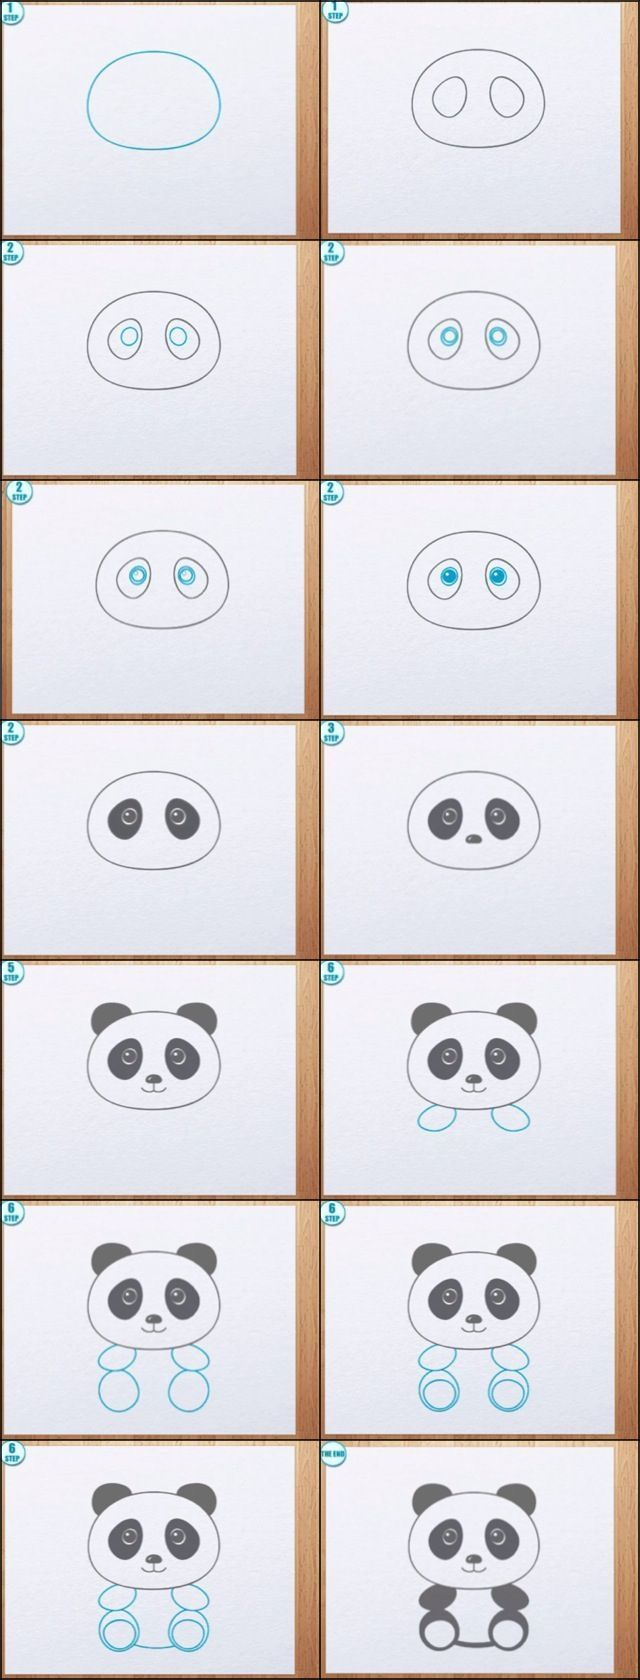 Dessin De Panda Facile pinmelissa k. mccarthy on doodling! in 2018 | pinterest | dessin